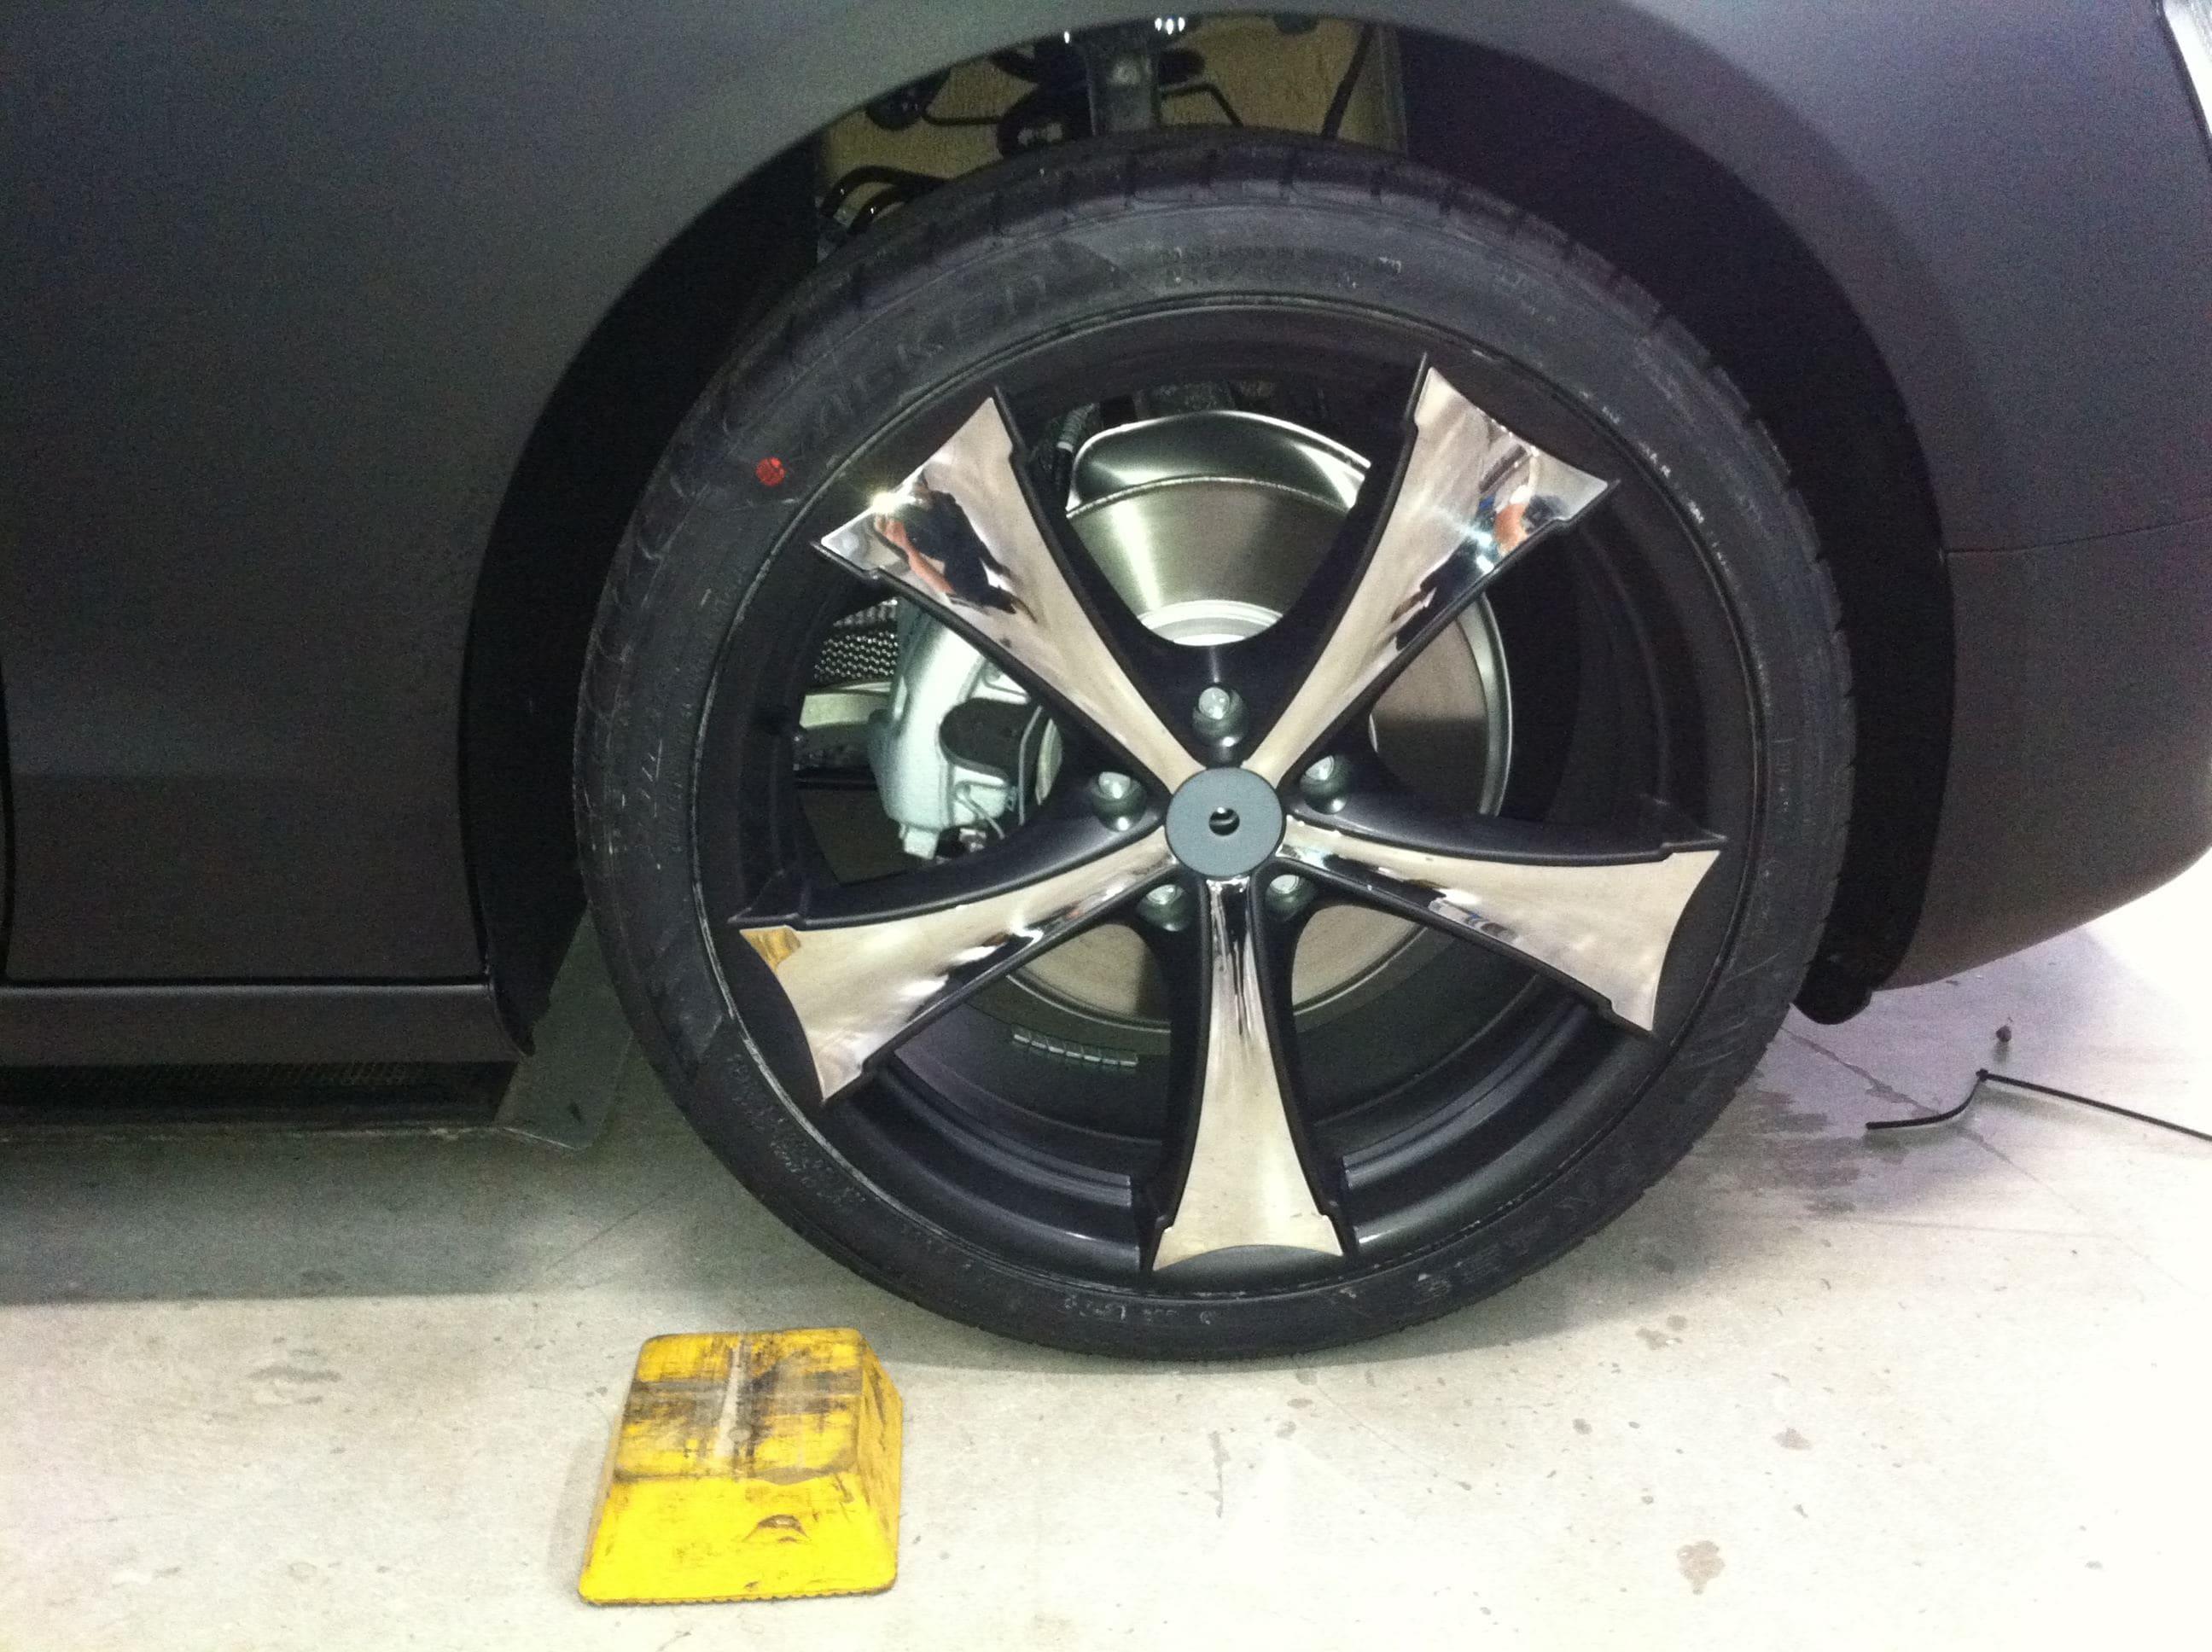 Audi A5 Sportback met Mat Grijze Wrap, Carwrapping door Wrapmyride.nu Foto-nr:4805, ©2021